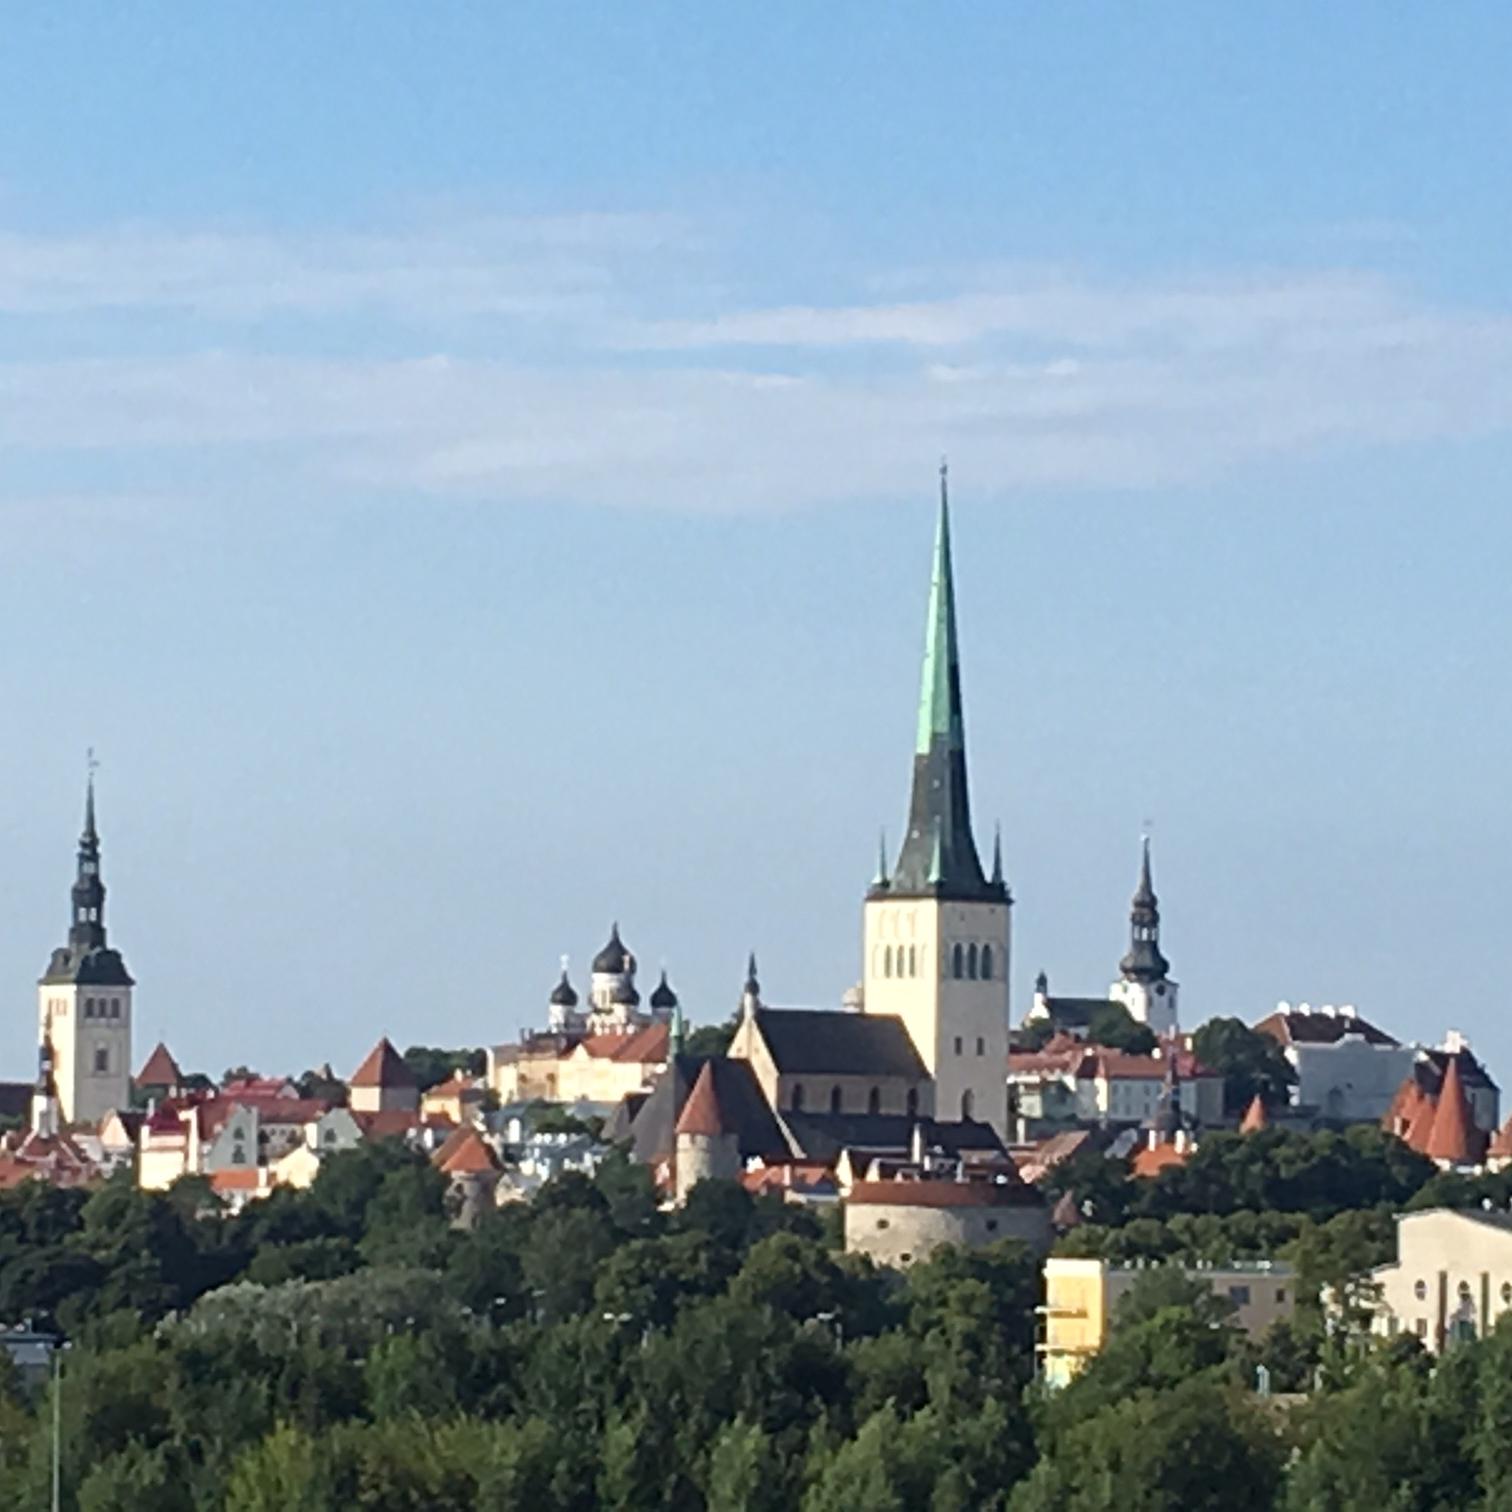 Tallin, Estonia by The Doubtful Traveller